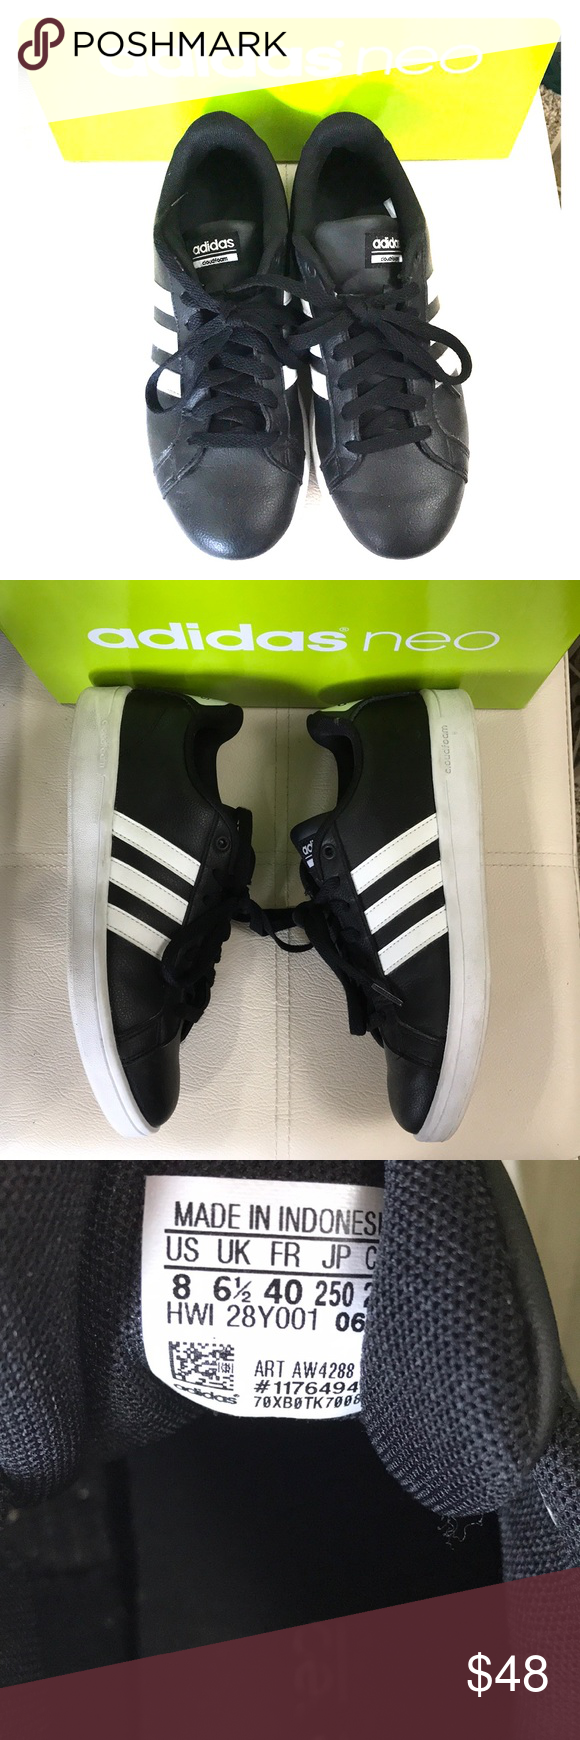 adidas neo size 8